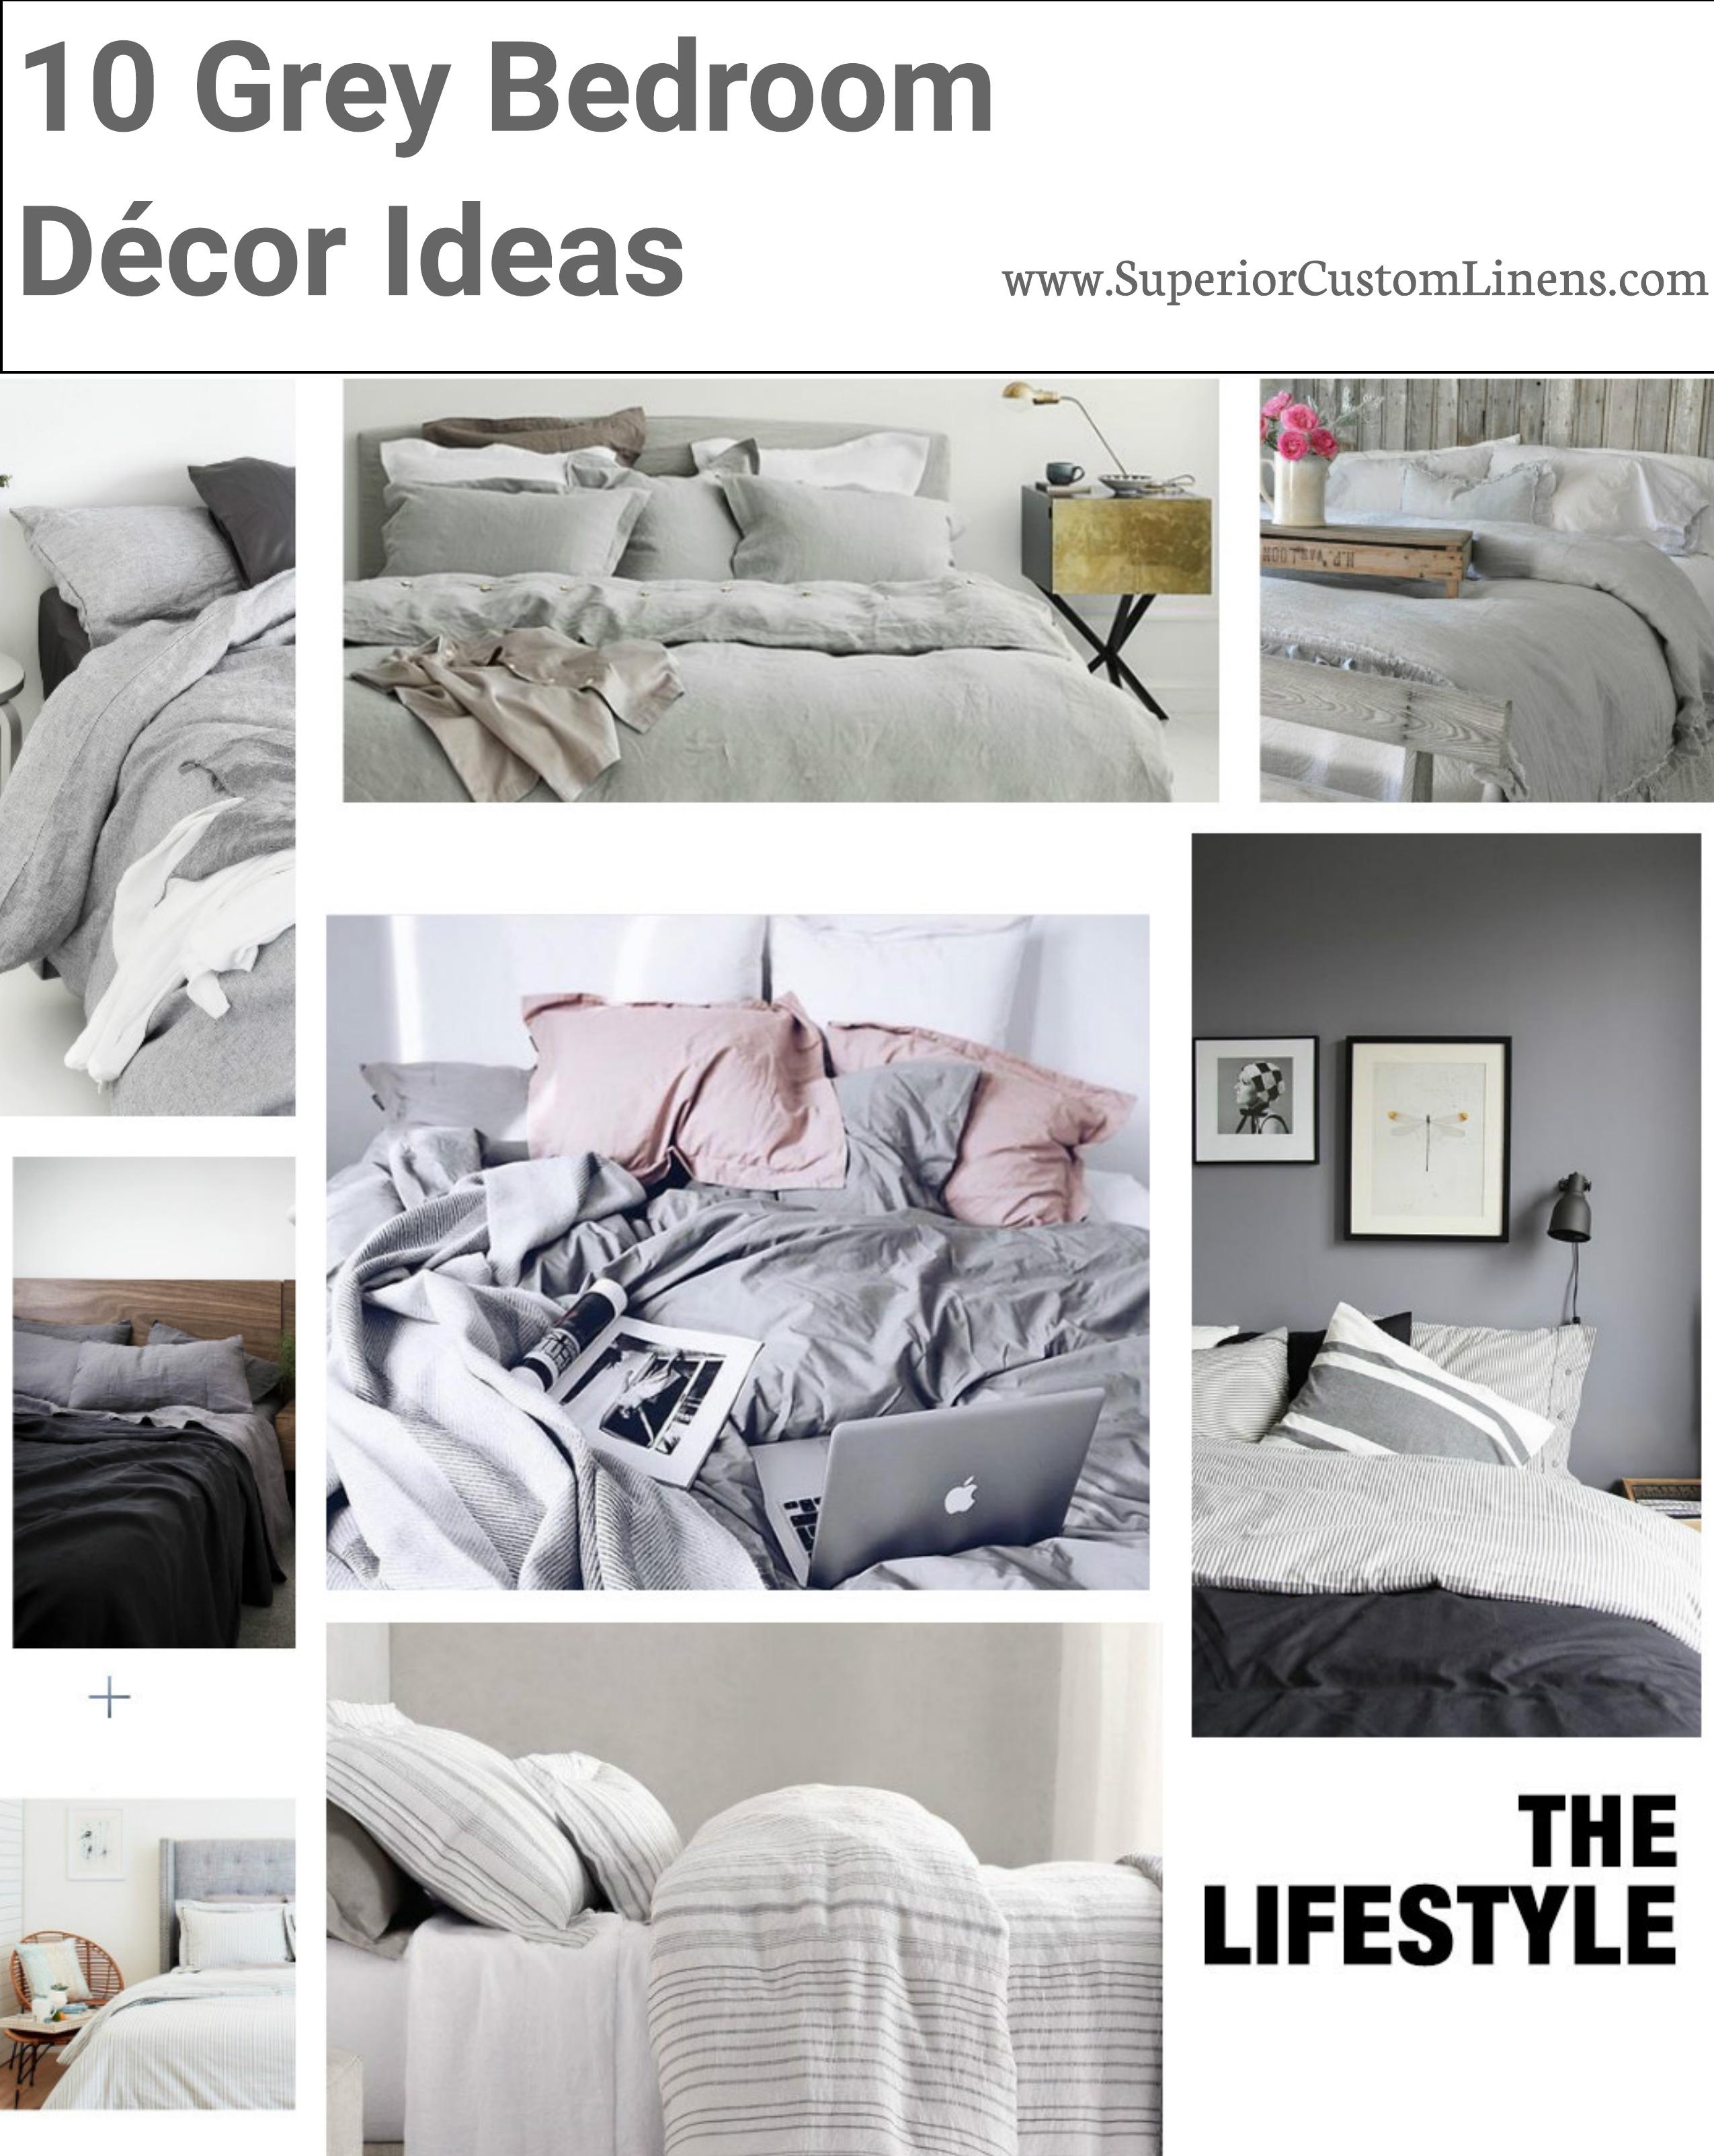 10 grey bedroom décor ideas - superior custom linens